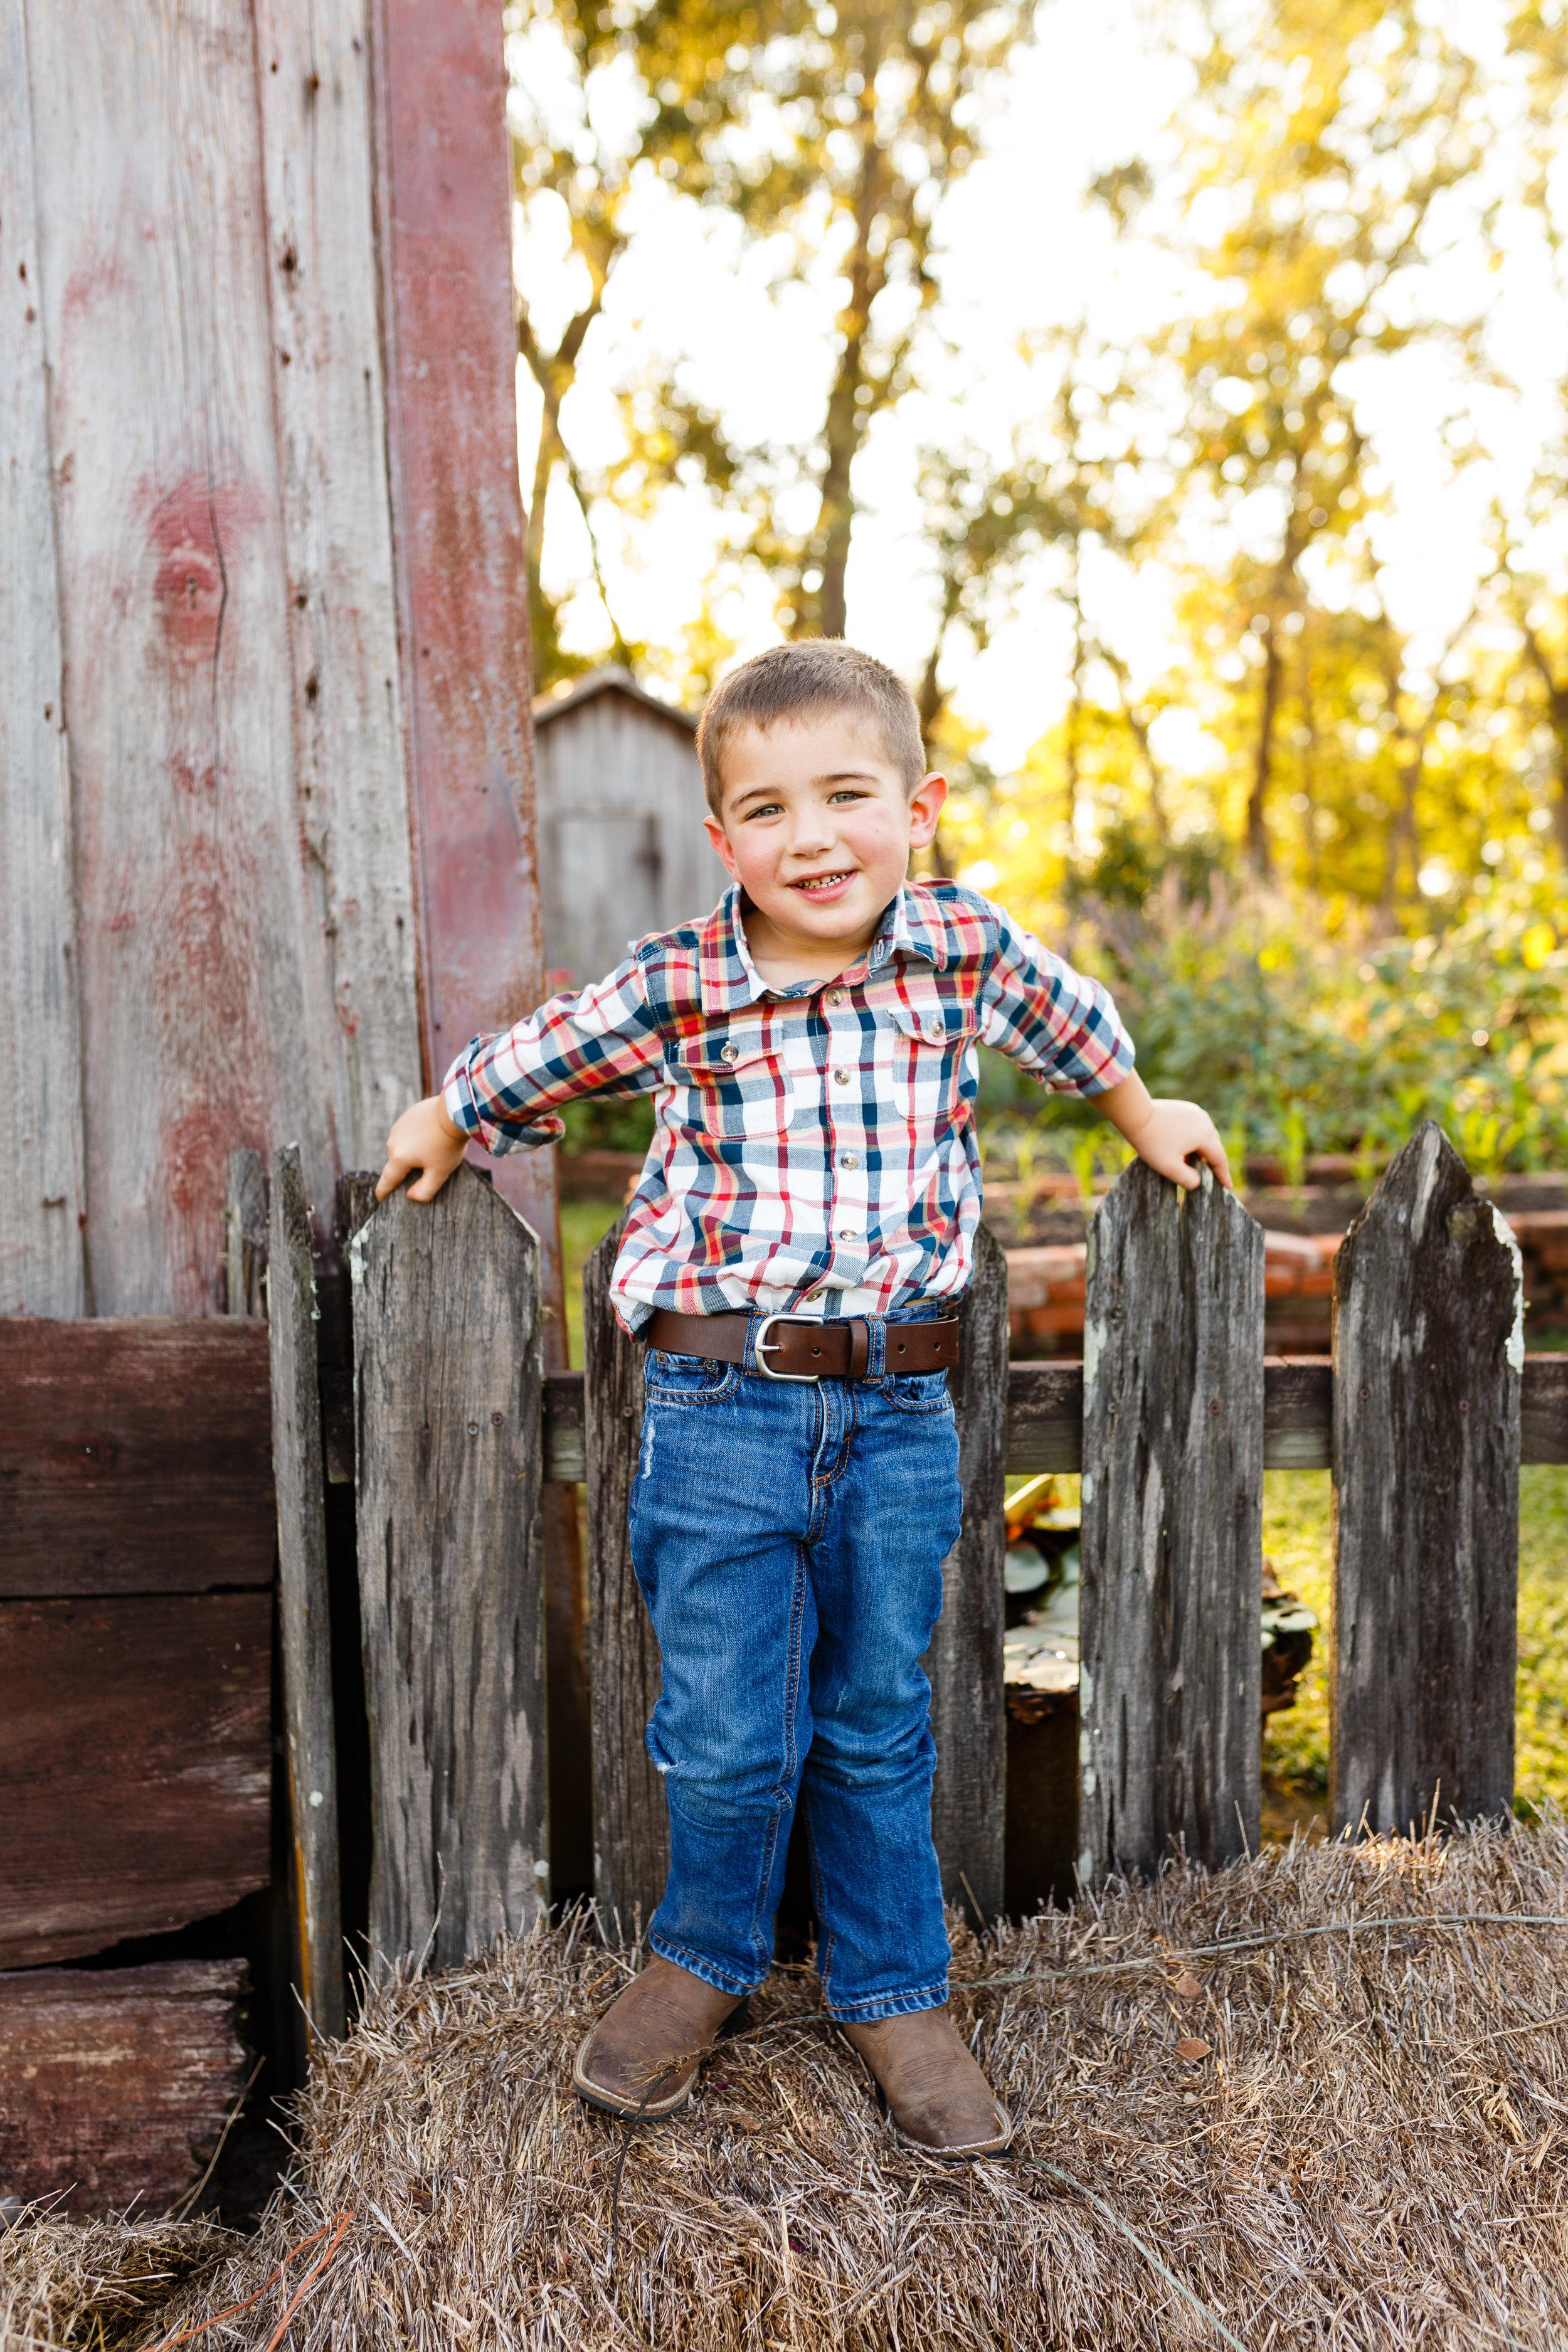 Family-child-portrait-lafayette-broussard-youngsville-photographer-13.jpg